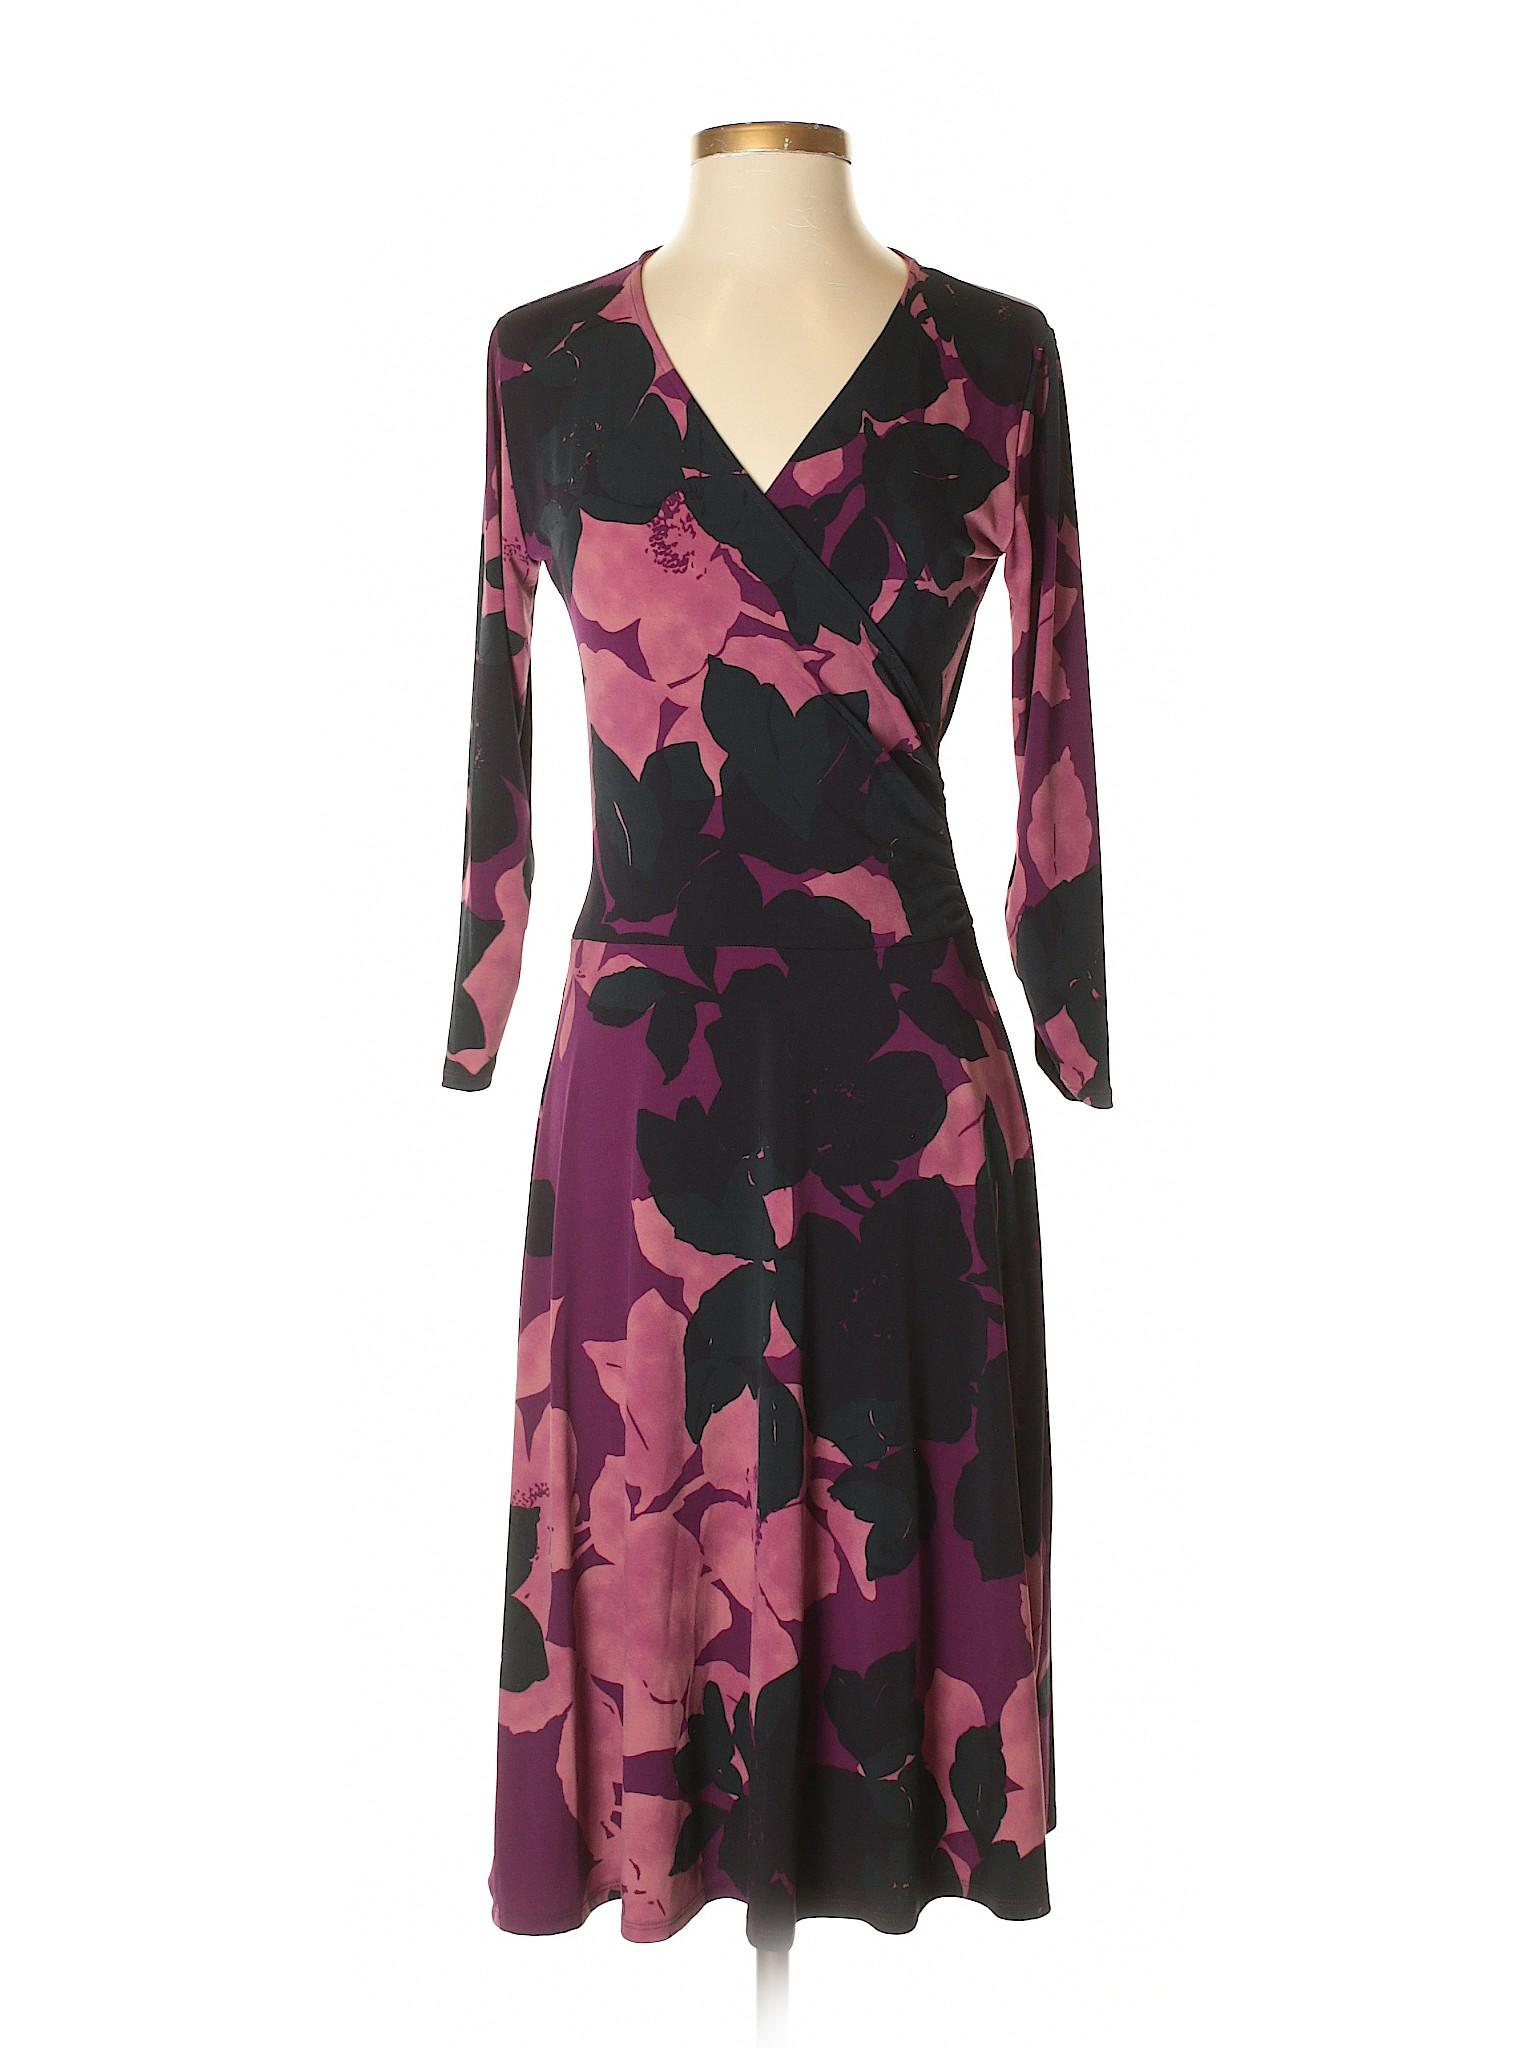 Casual Boutique winter winter Dress Boutique CAbi dIIrqgwZ